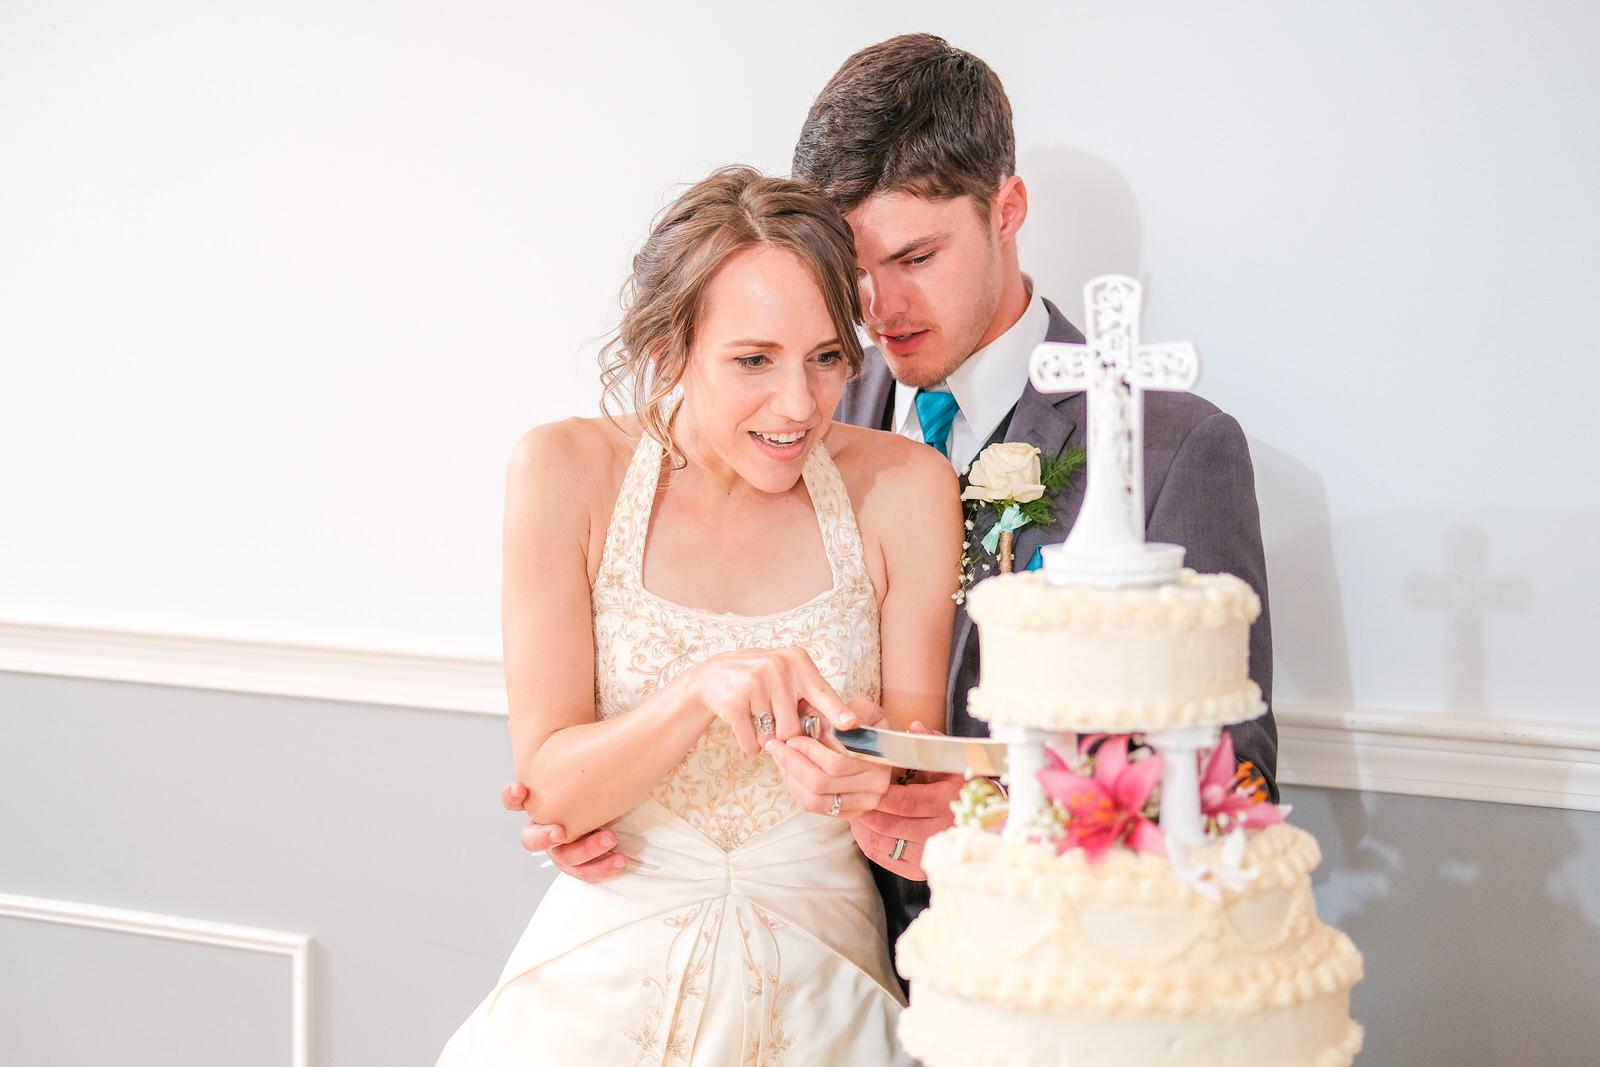 southern-nh-wedding-photography-1095-1.jpg